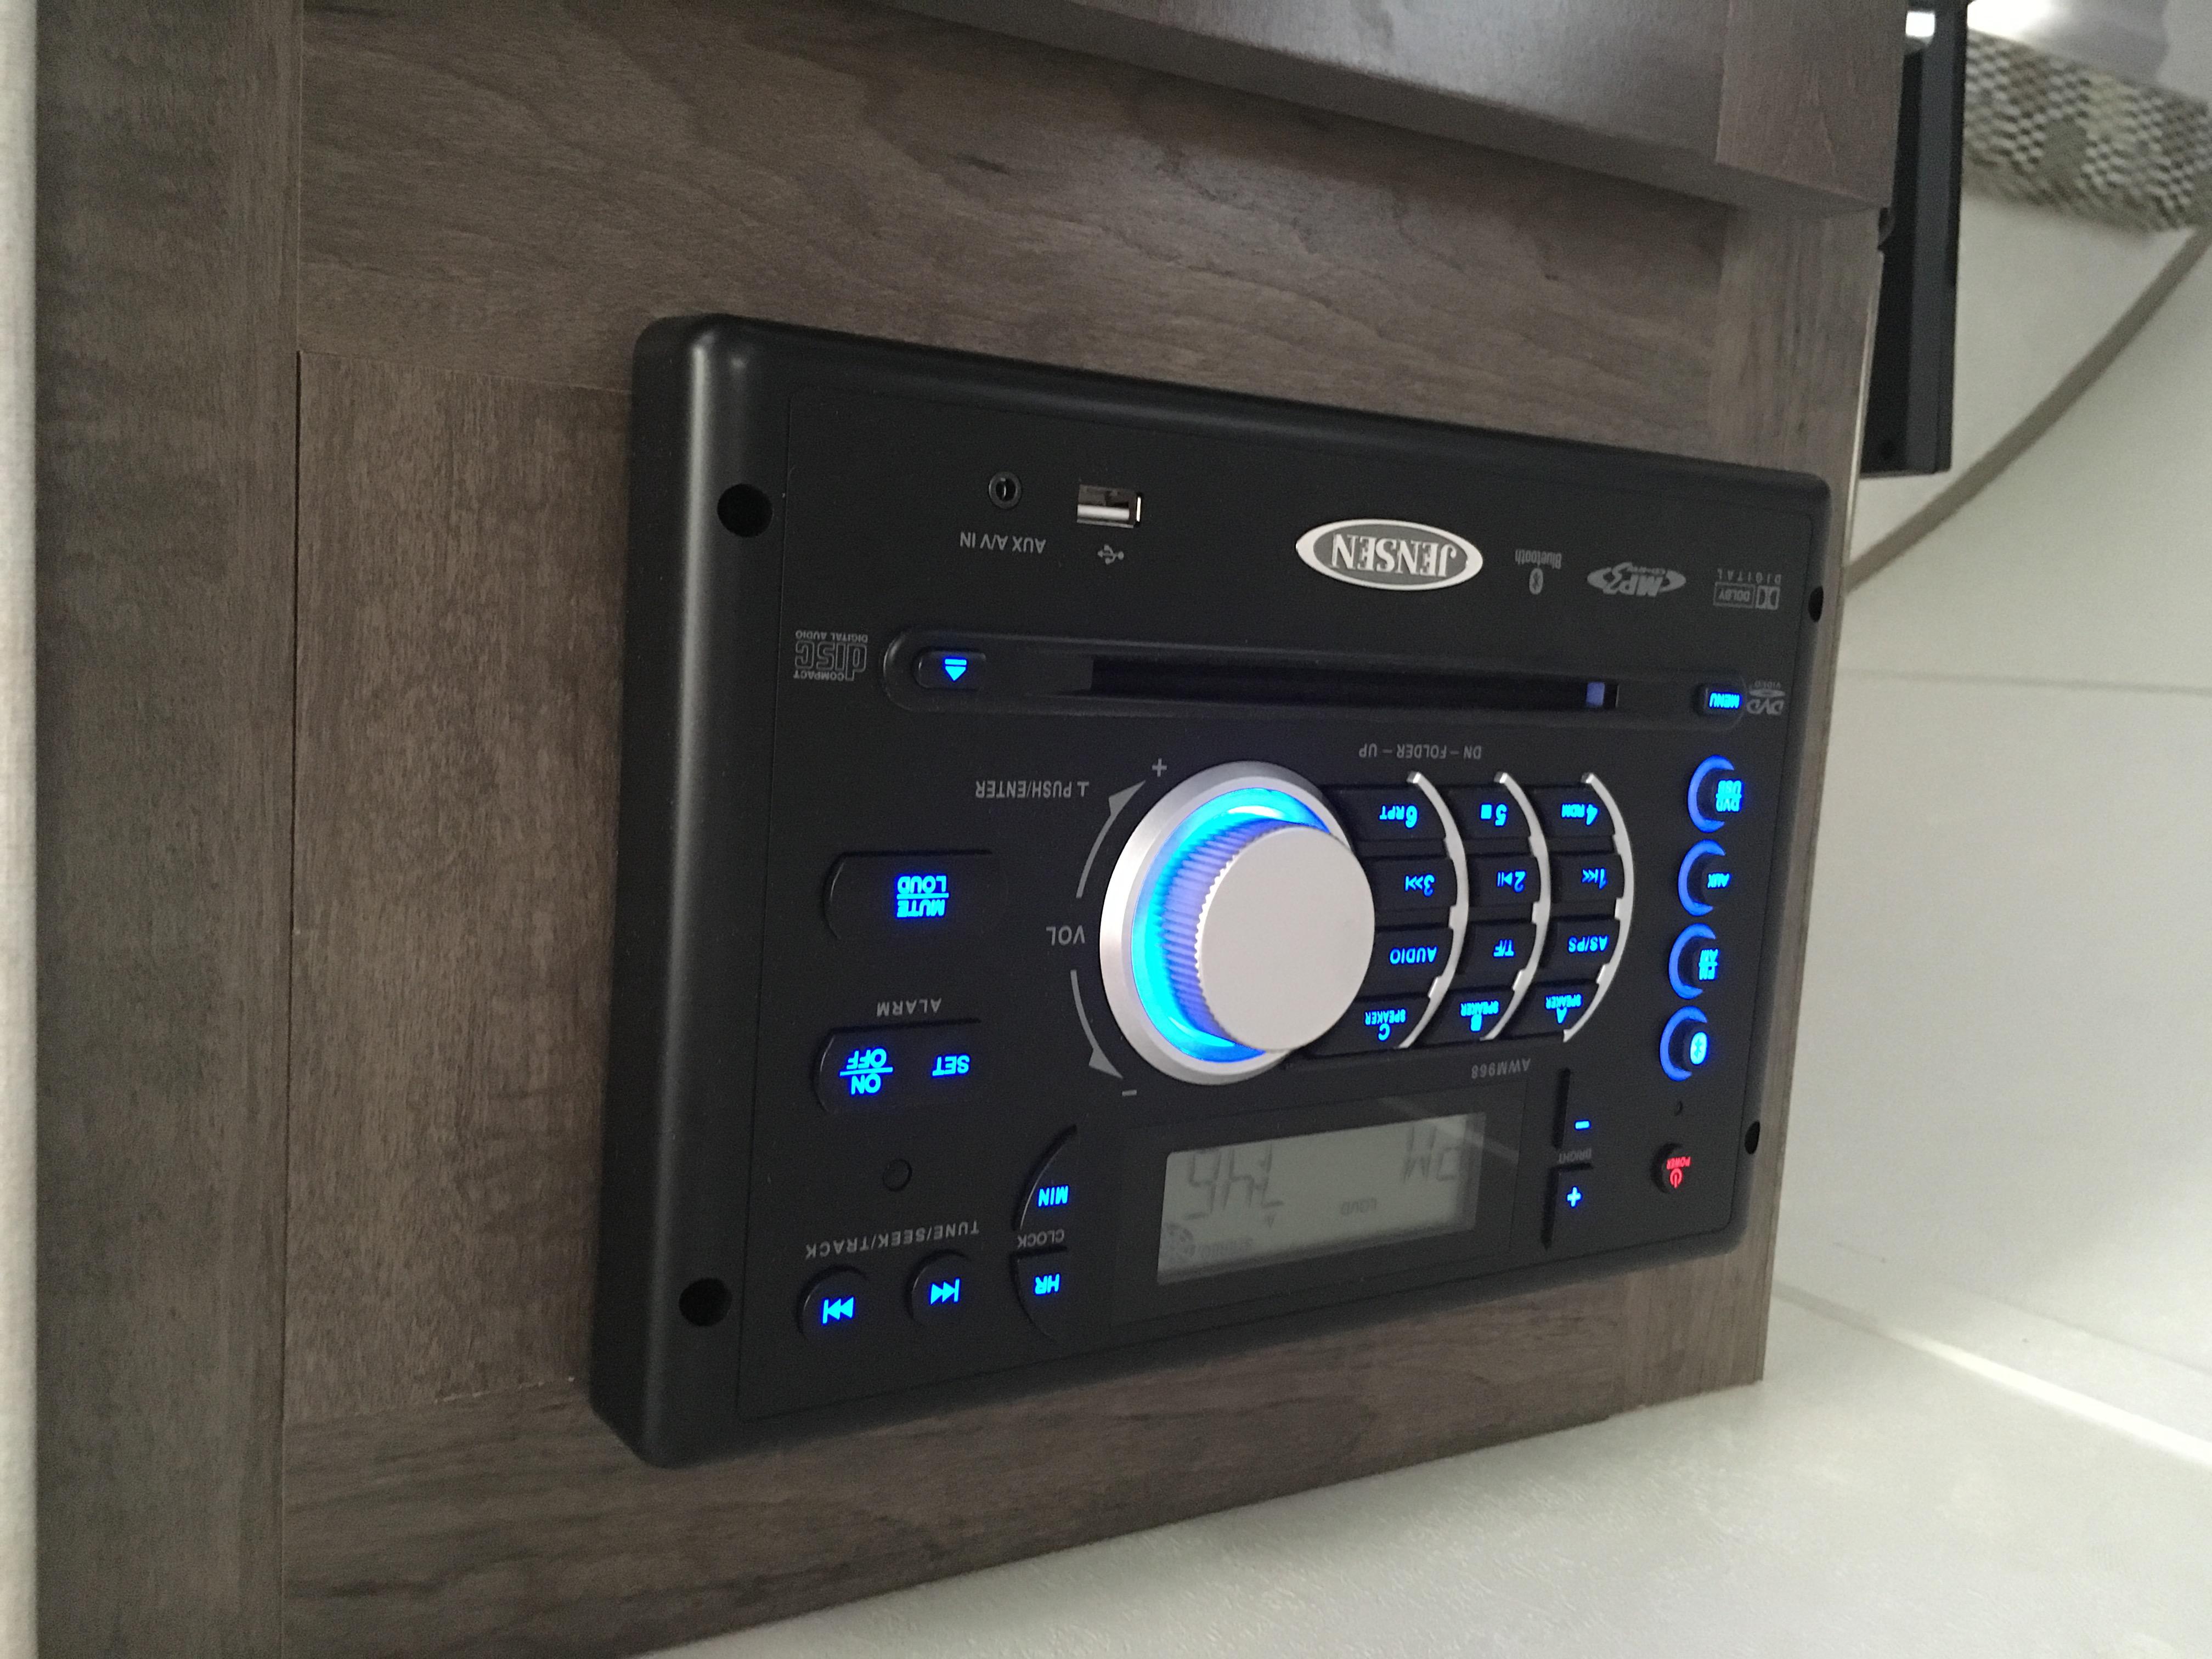 DVD/CD/Radio/USB/TV control panel.